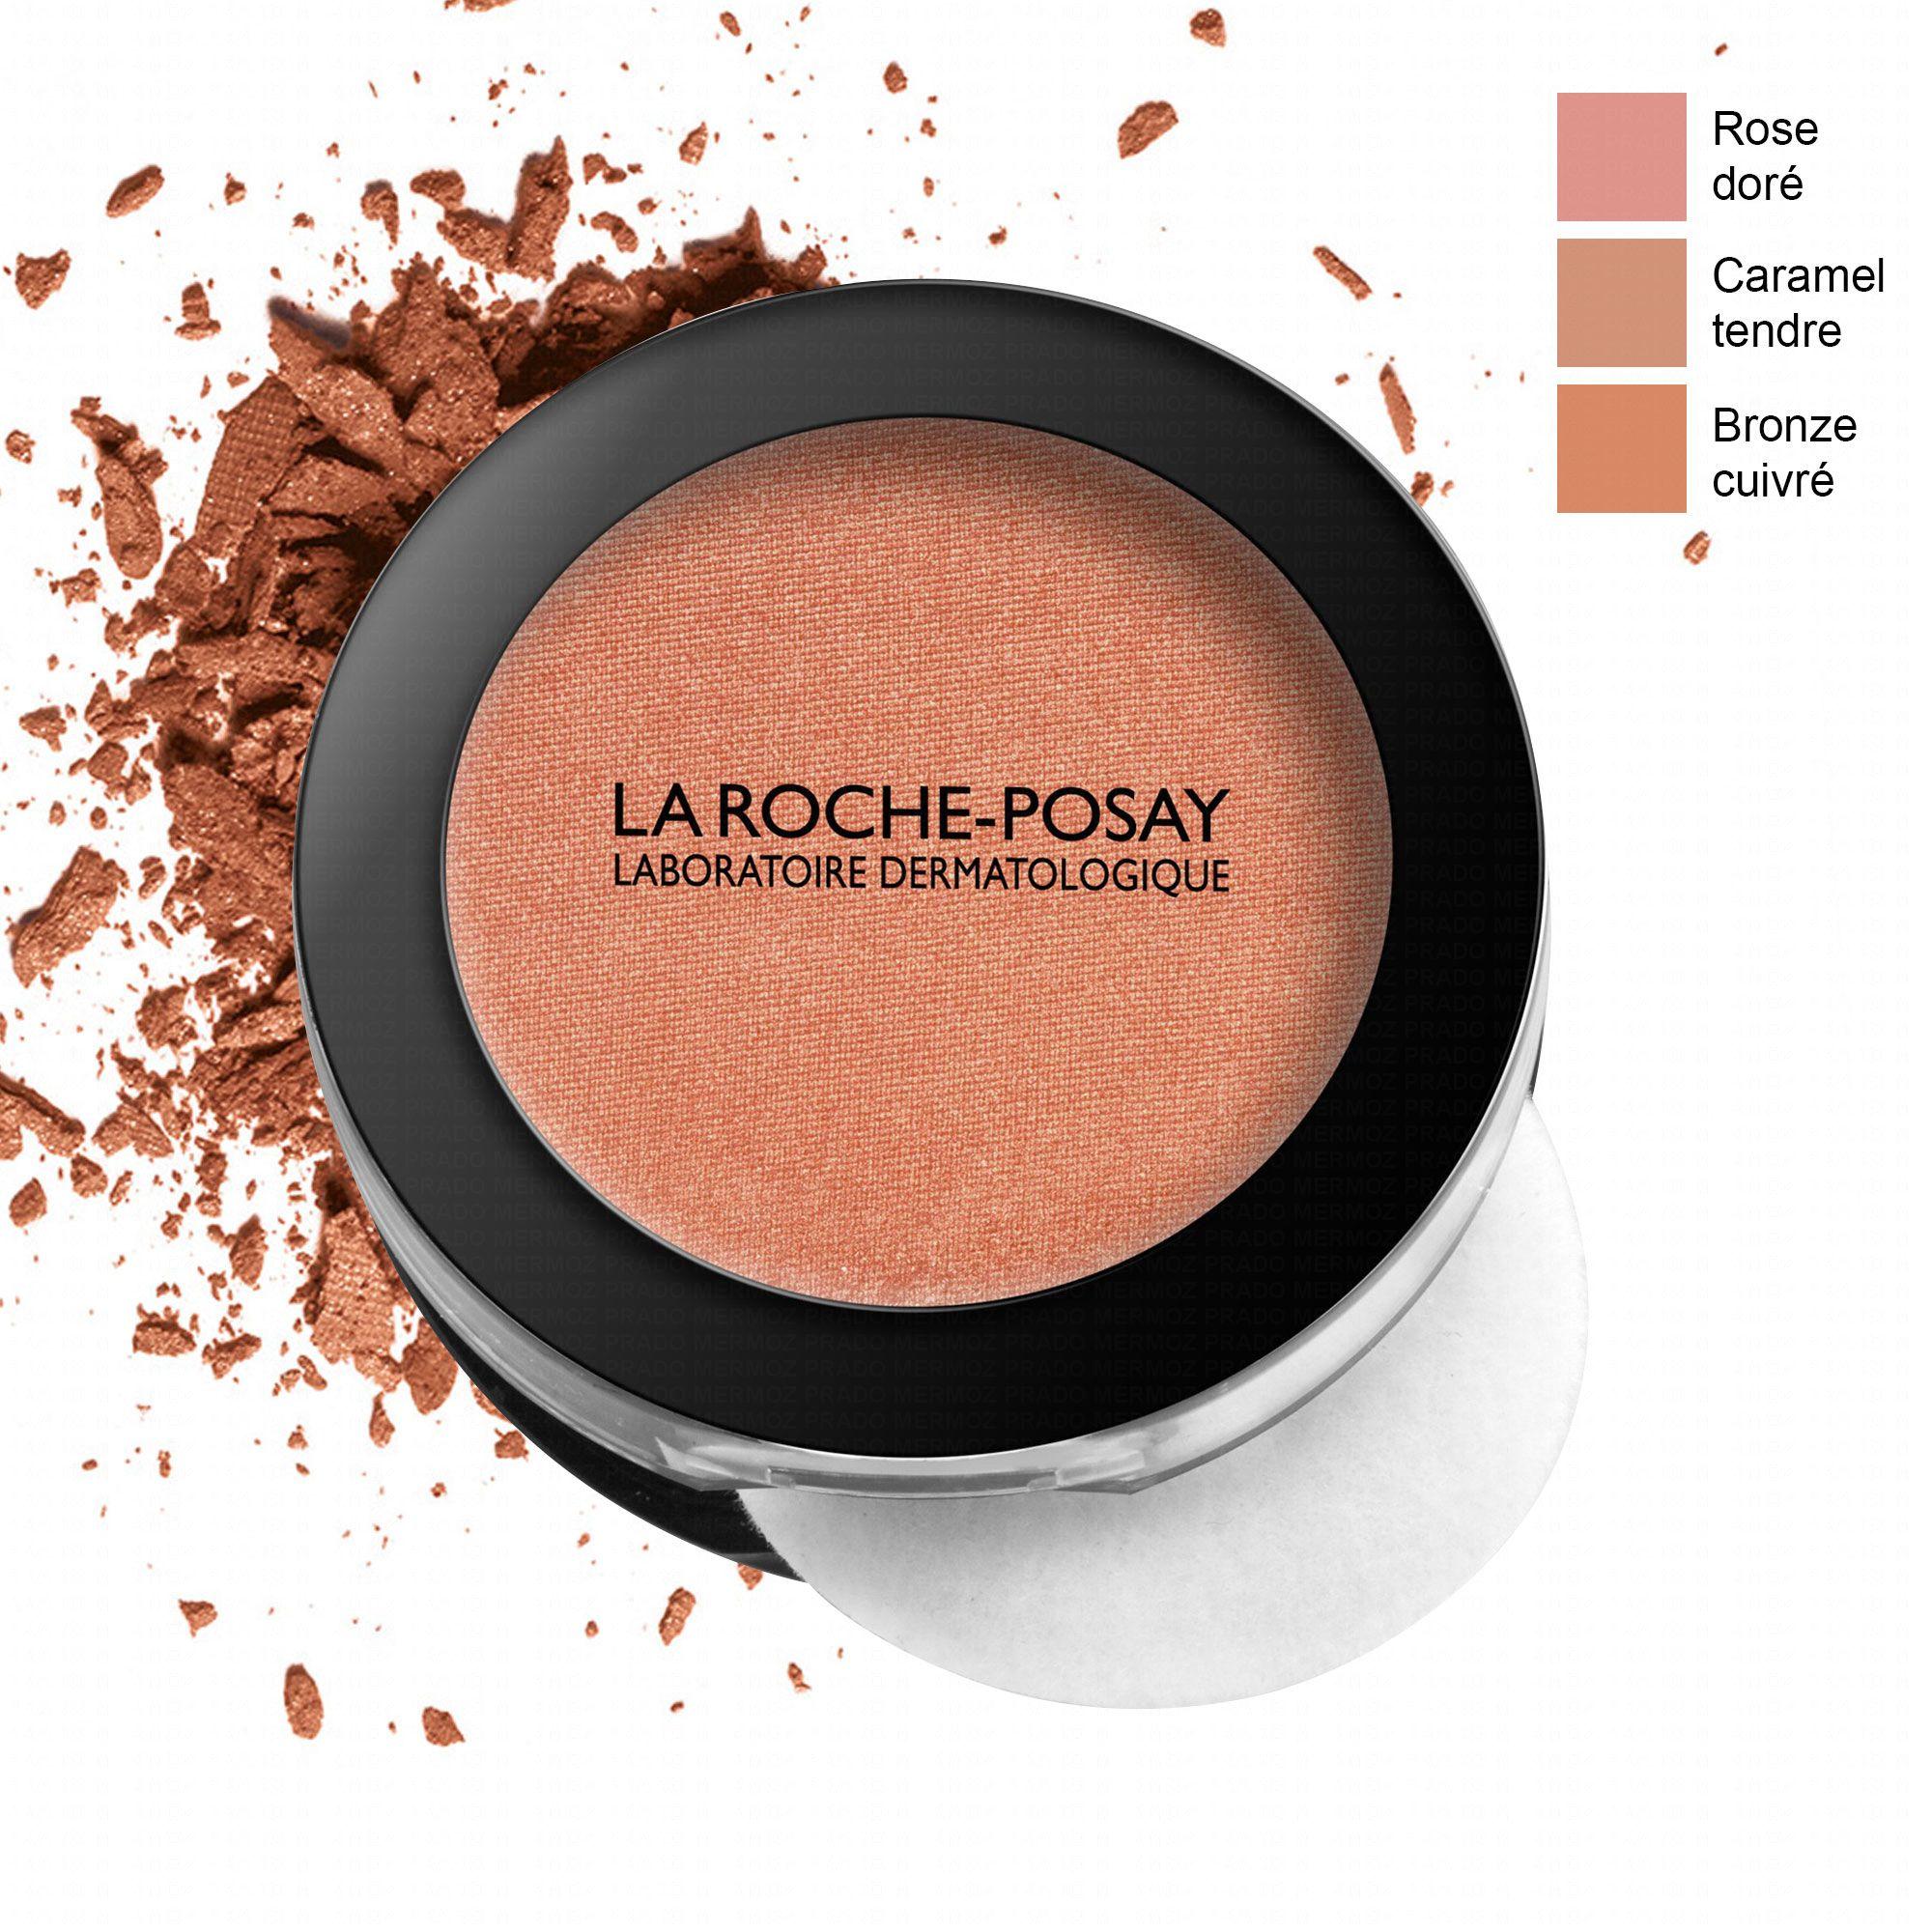 La Roche-Posay Toleriane Teint Blush Ρουζ για Φυσικά Λαμπερό Αποτέλεσμα 5gr – 04 Bronze